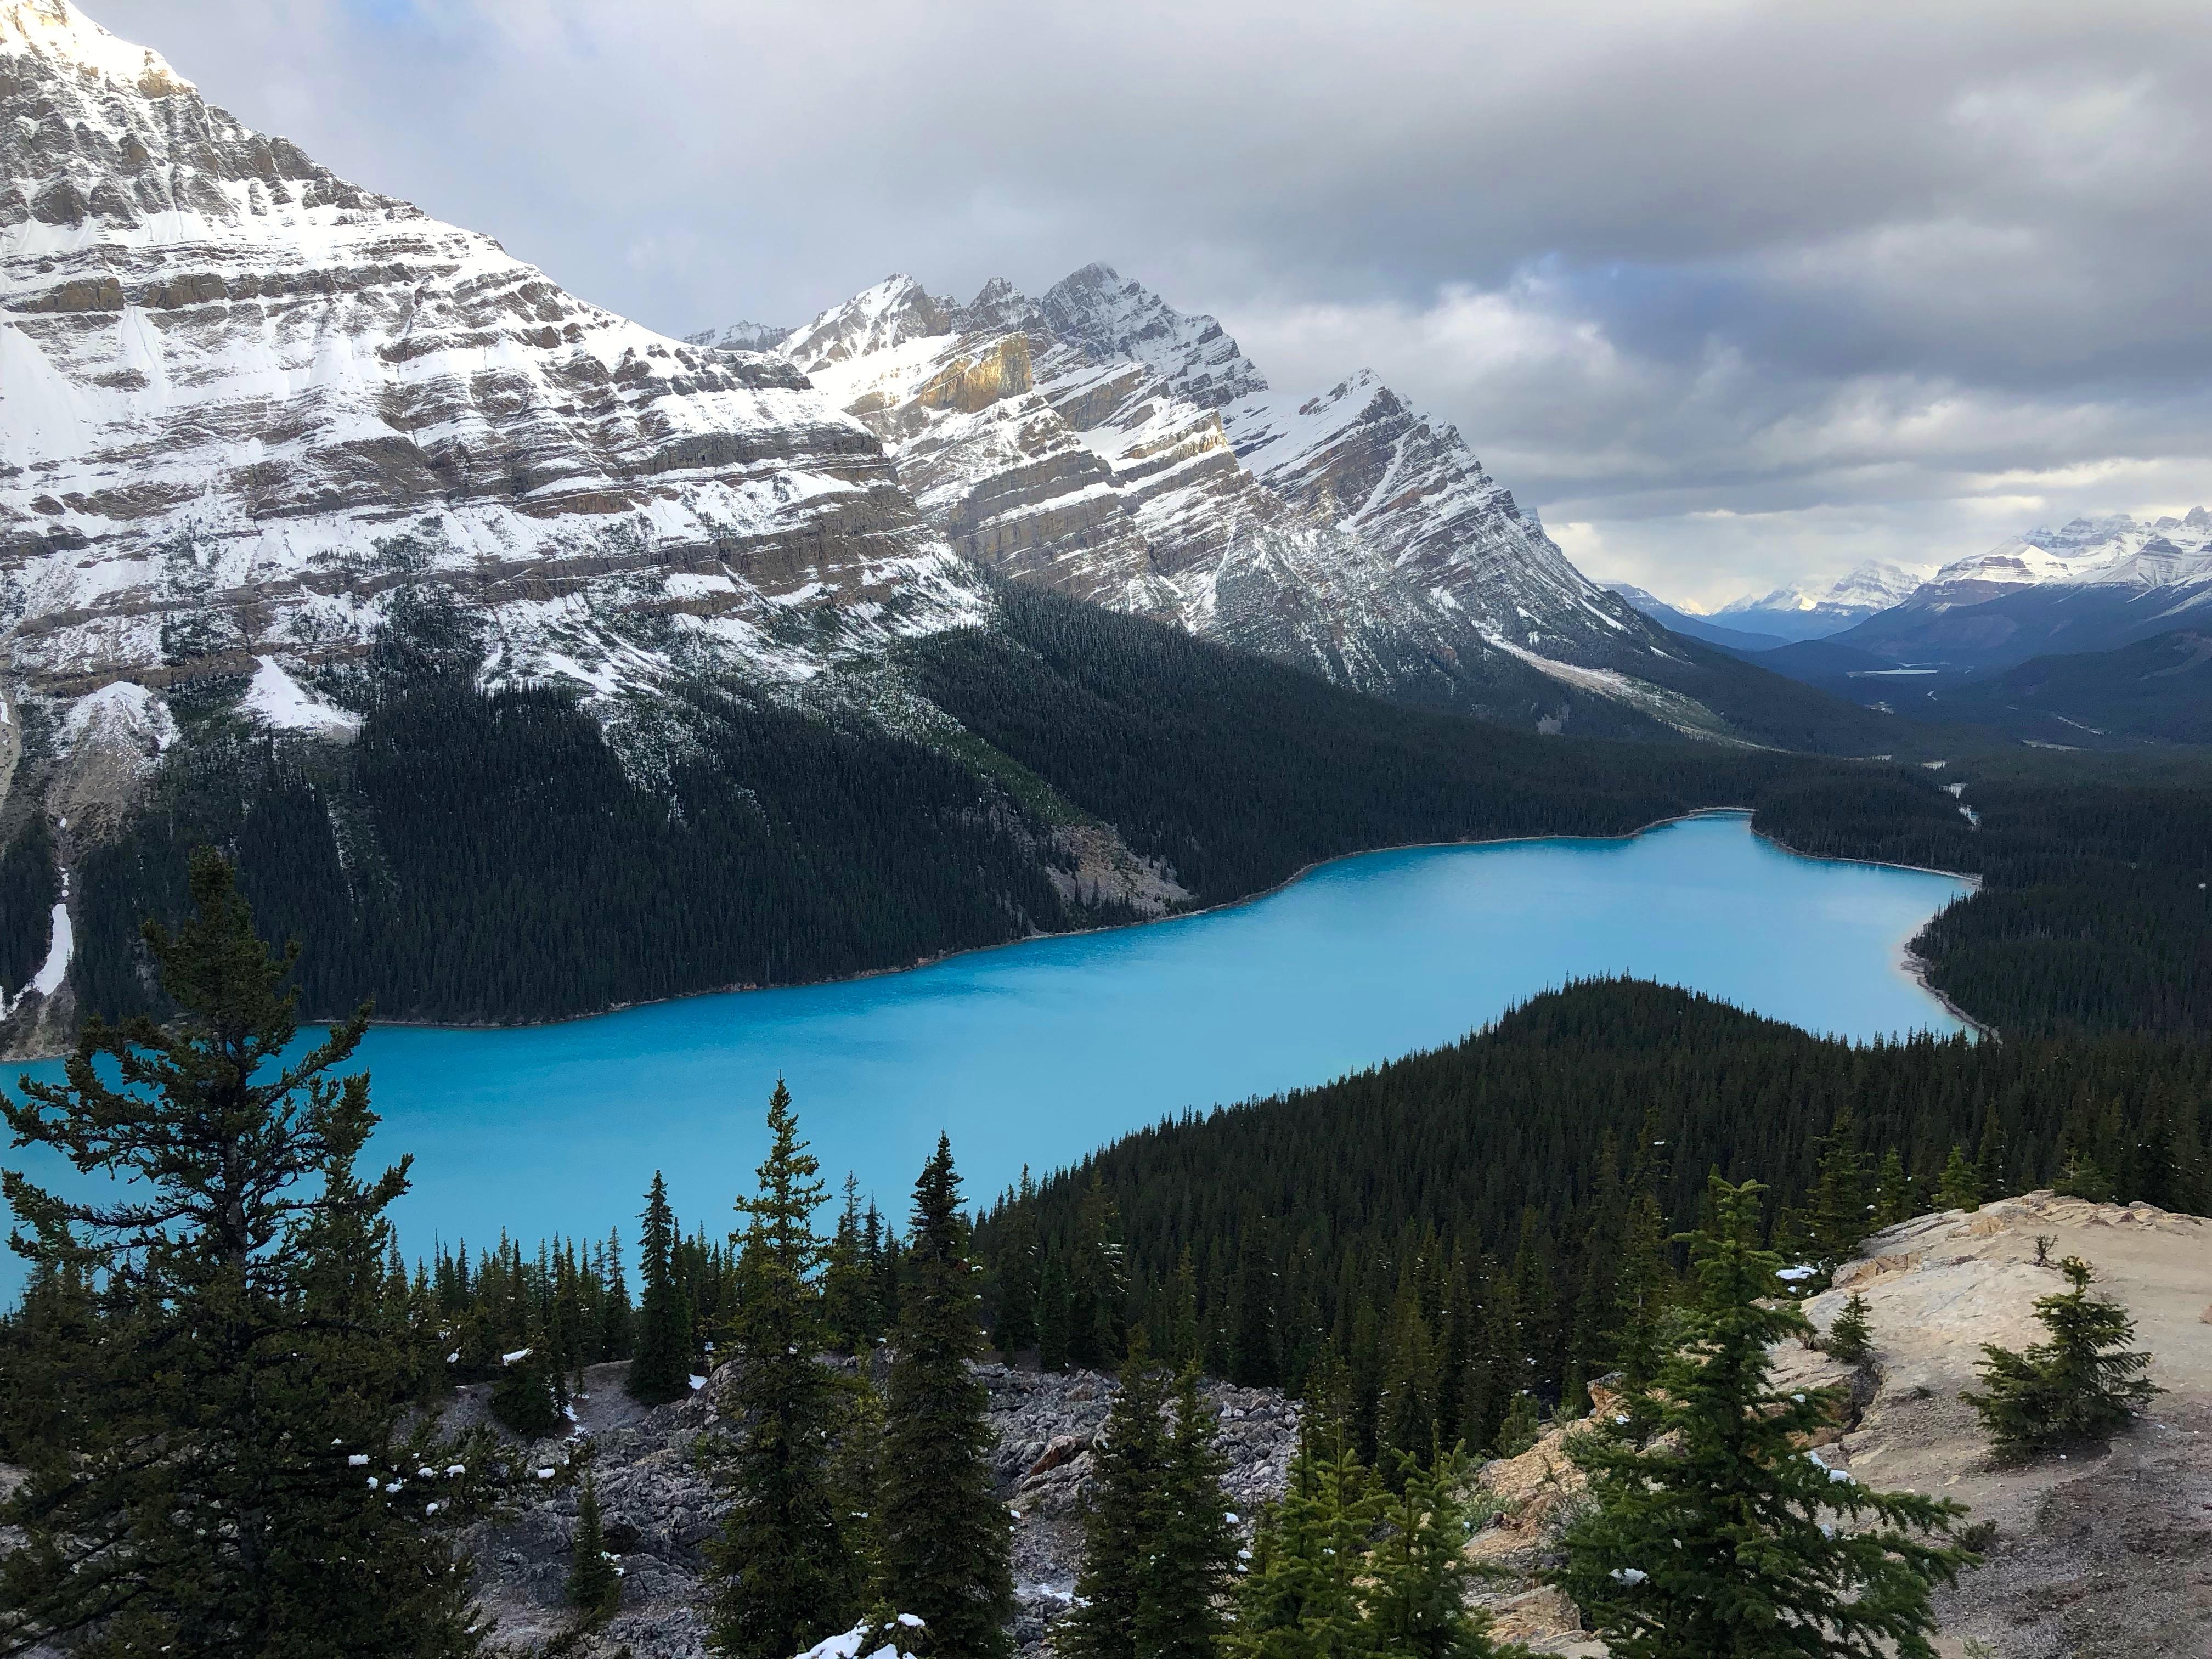 Canada Rockies TrekAmerica Itrekhere 2018 170